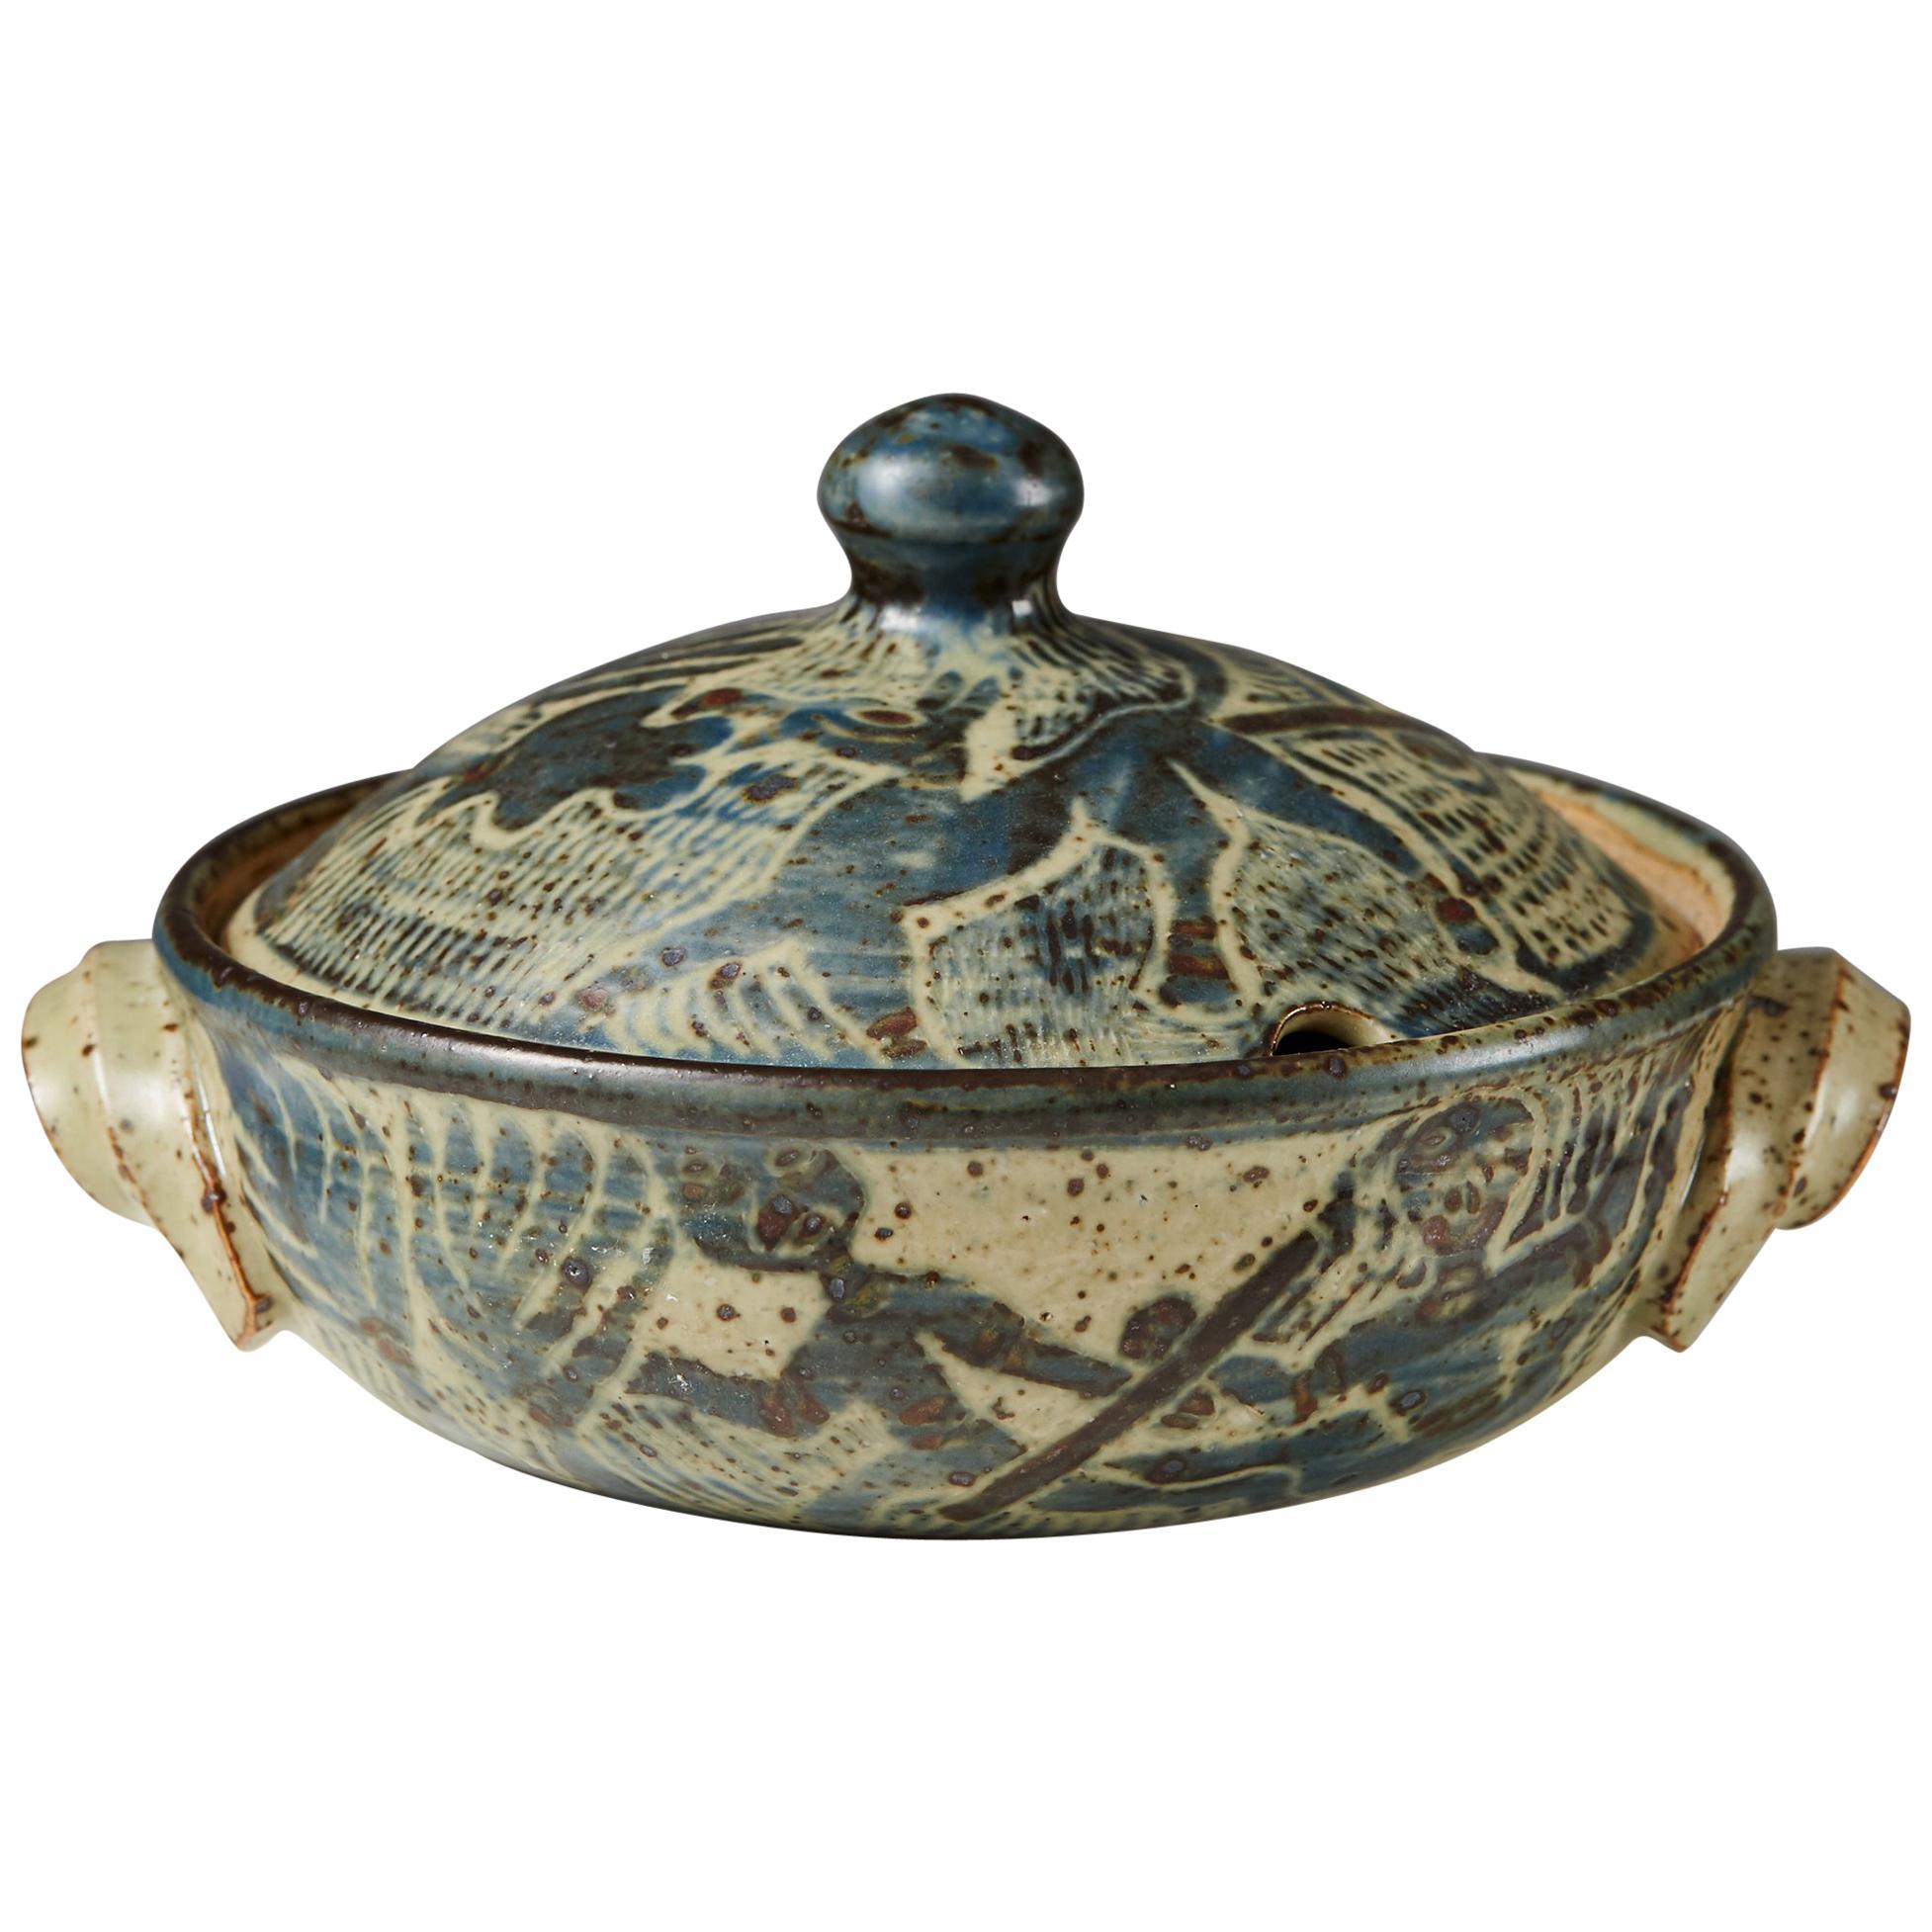 Lidded Bowl Designed by Niels Refsgaard, Denmark, 1960s-1970s